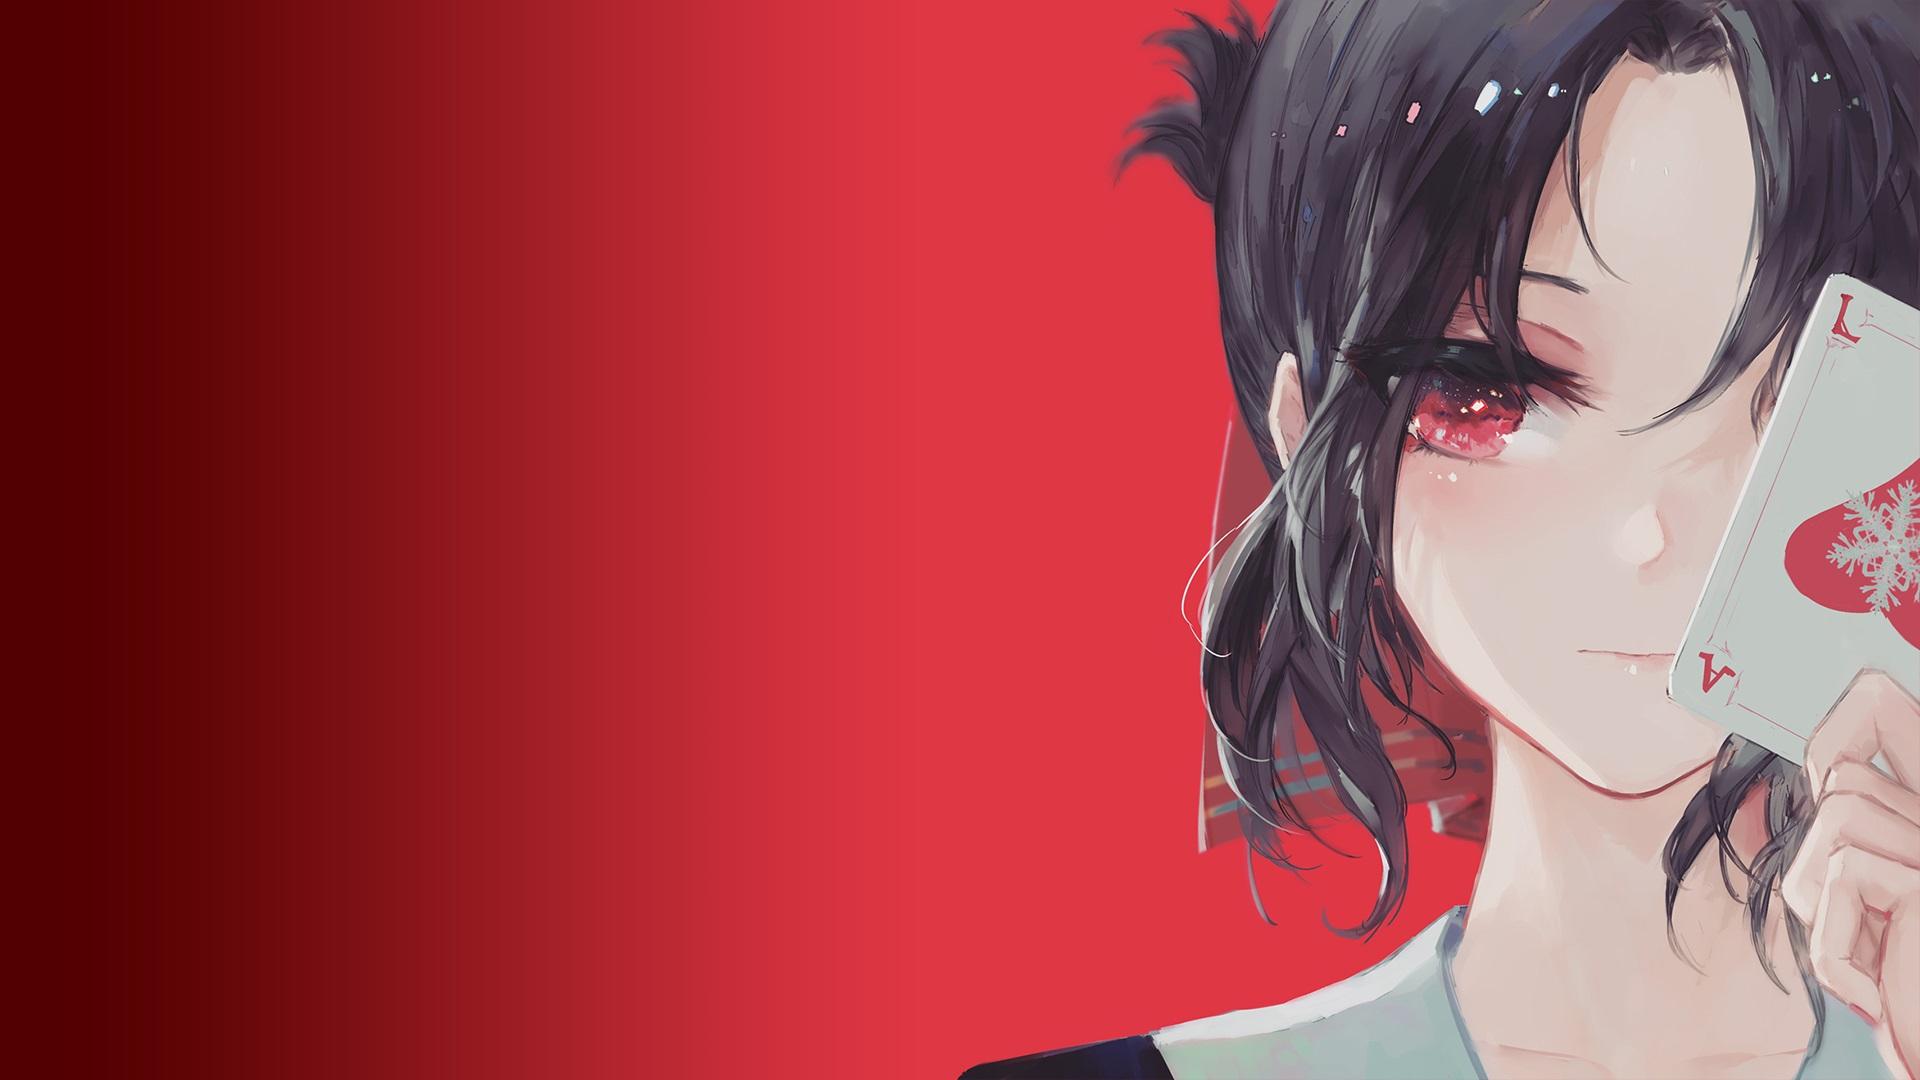 Anime 1920x1080 Kaguya-Sama: Love is War Kaguya Shinomiya anime anime girls red background card red eyes black hair KiSei2